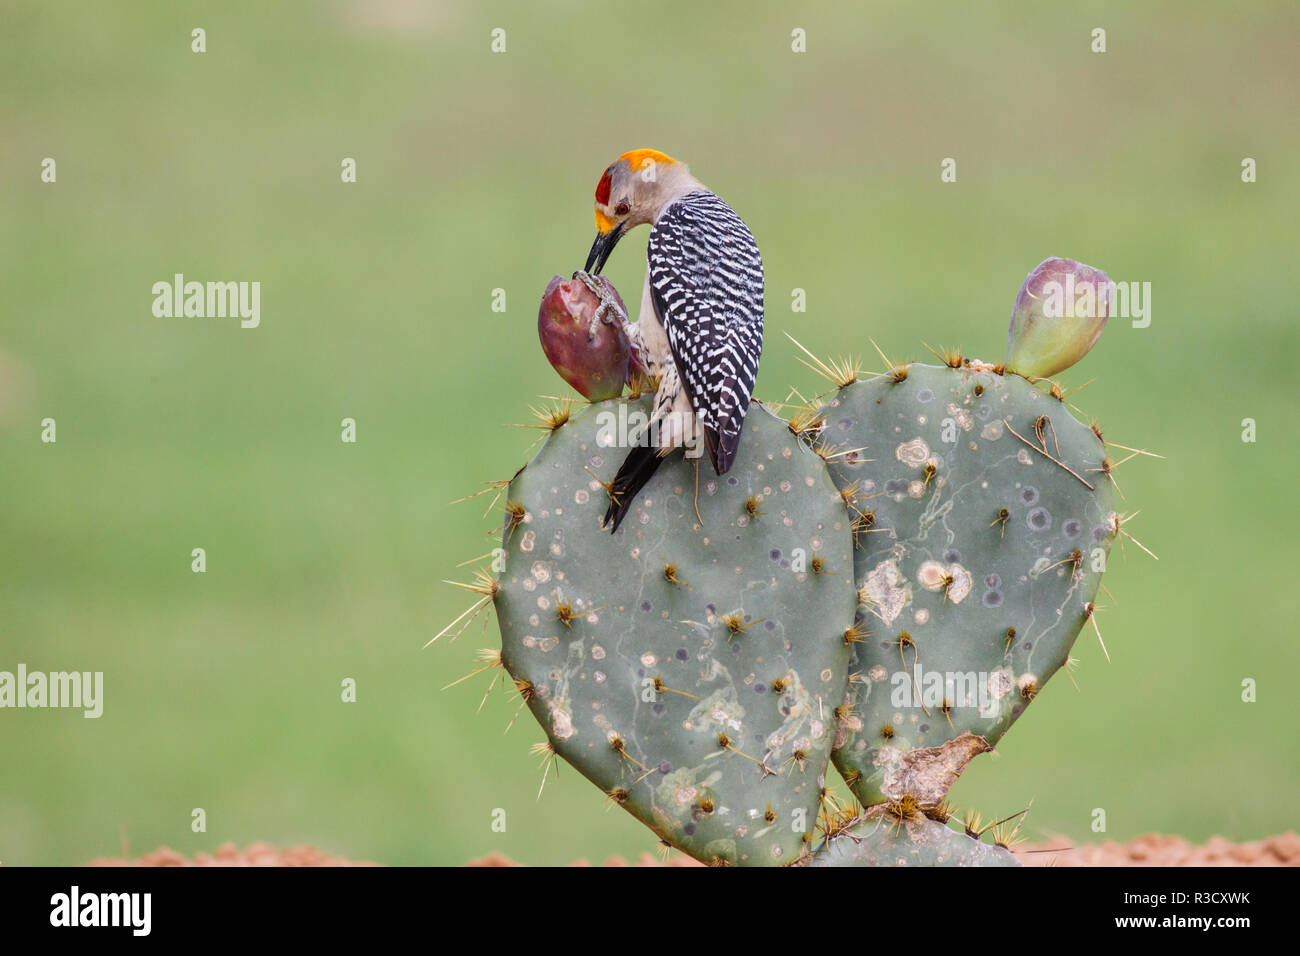 Larry Bird Stock Photos & Larry Bird Stock Images - Page 2